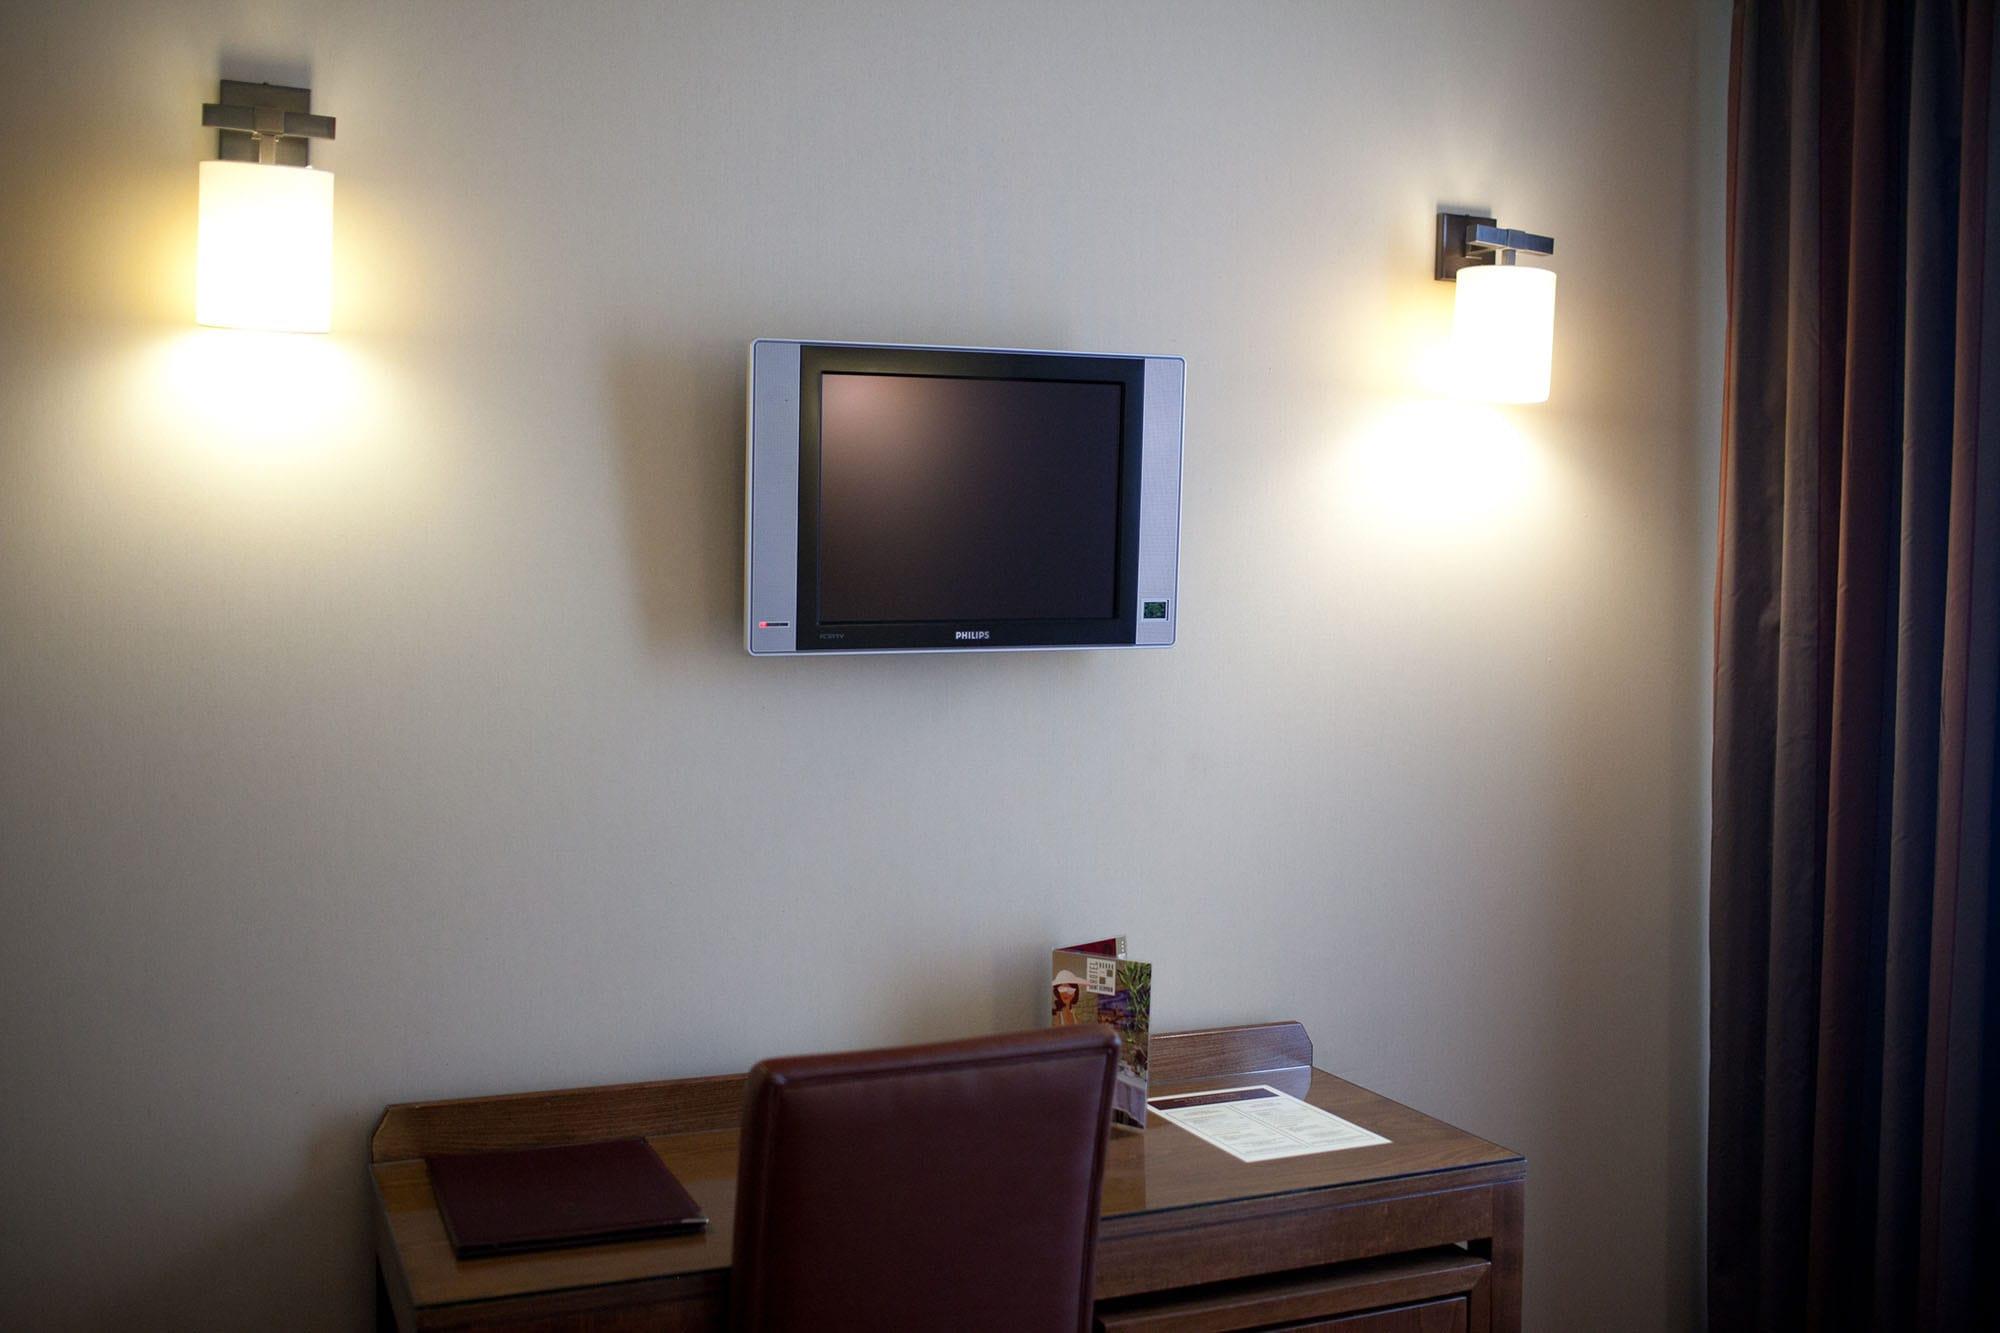 Television in my Paris hotel room.